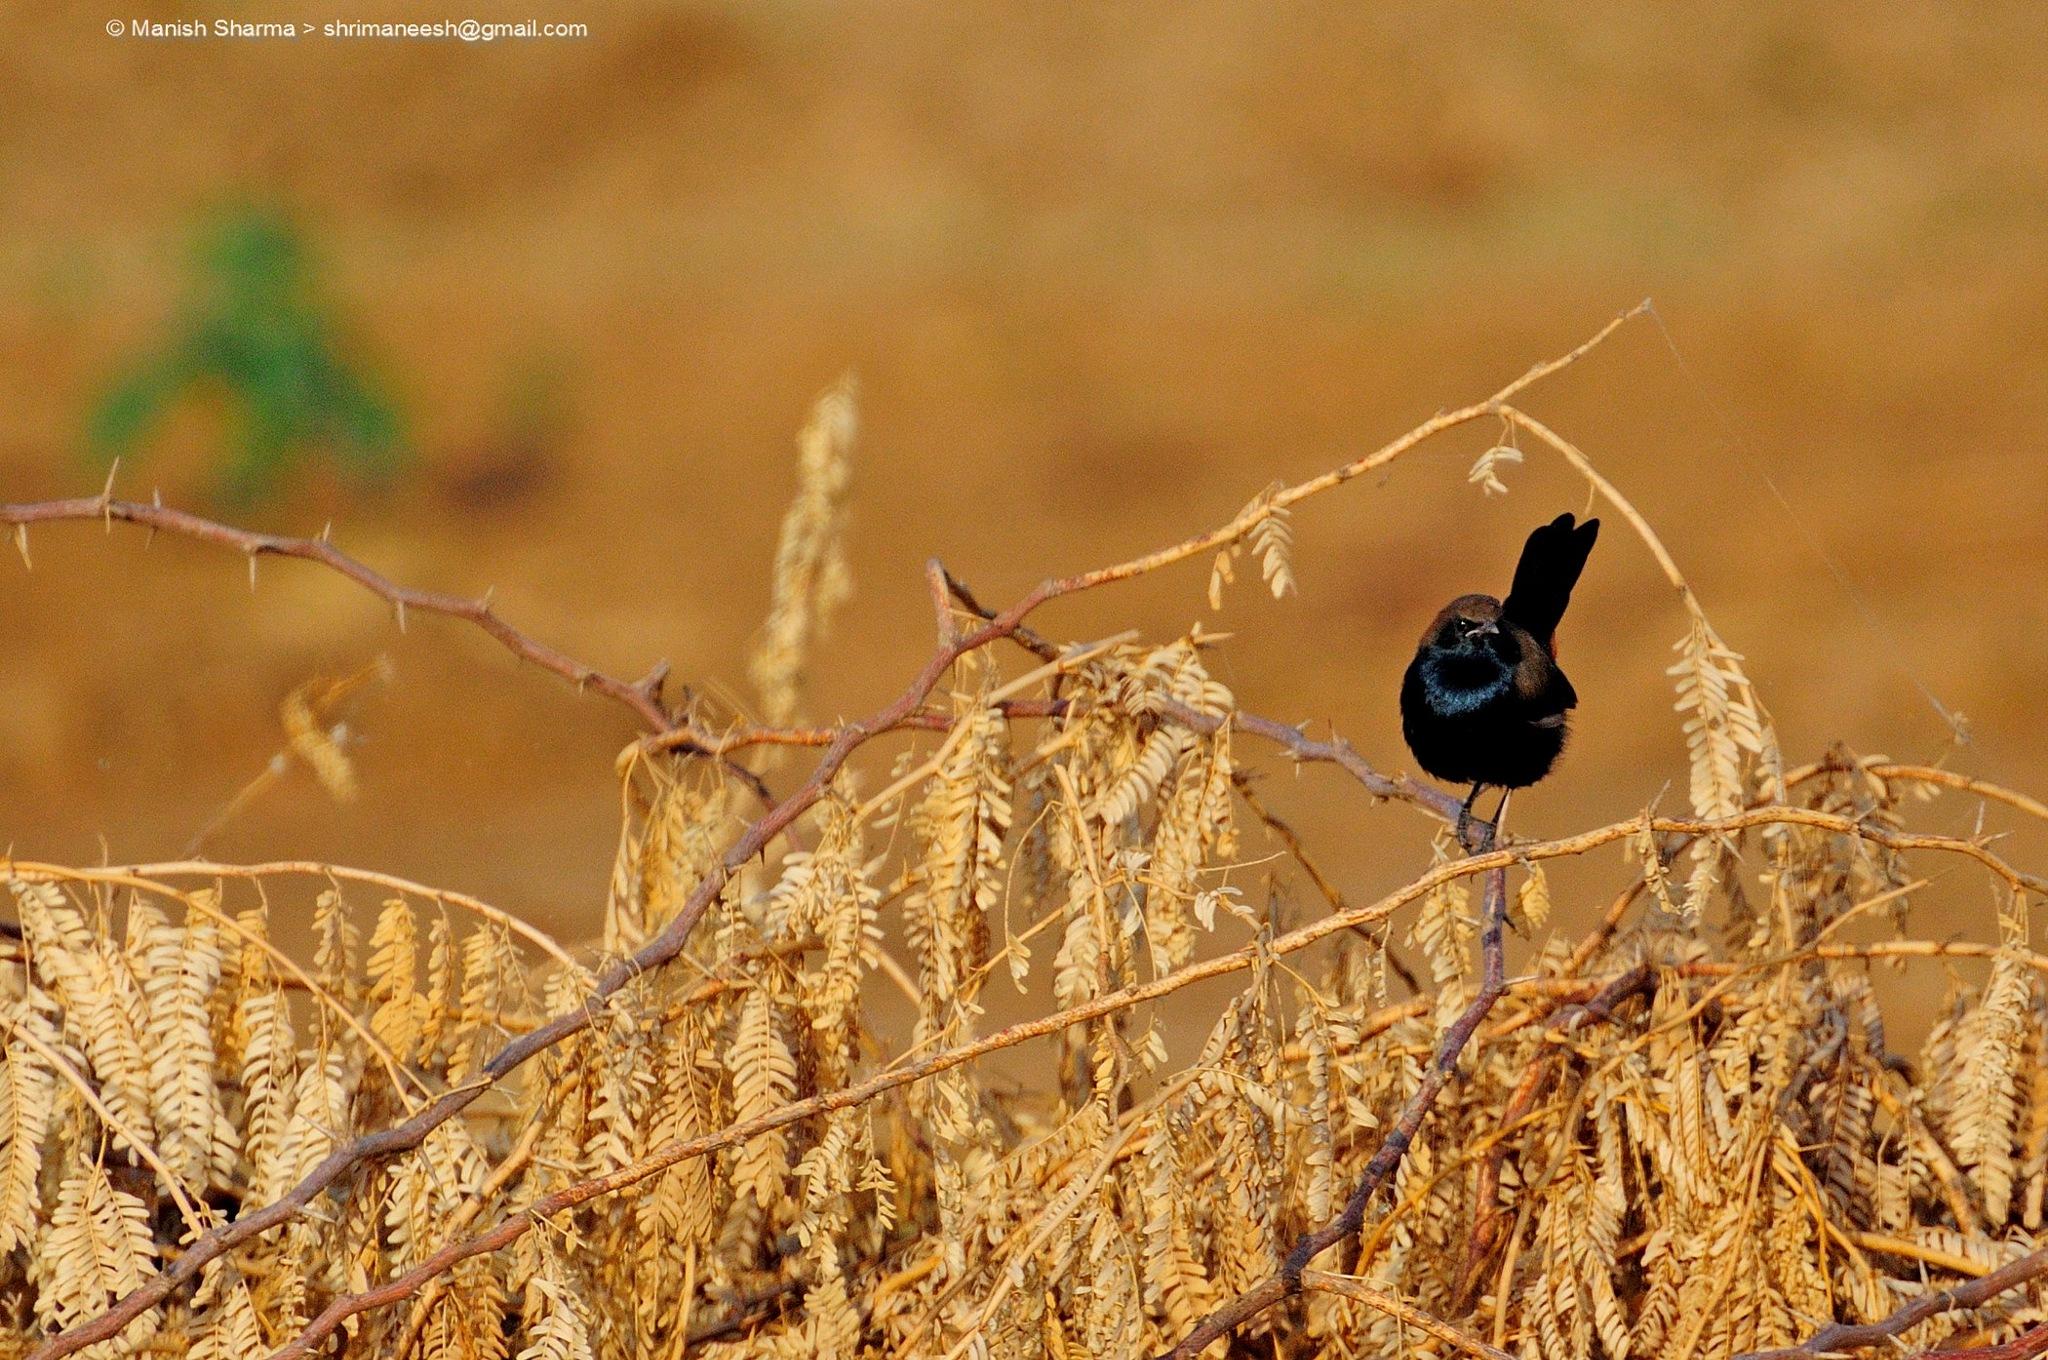 Untitled by Maneesh Sharma